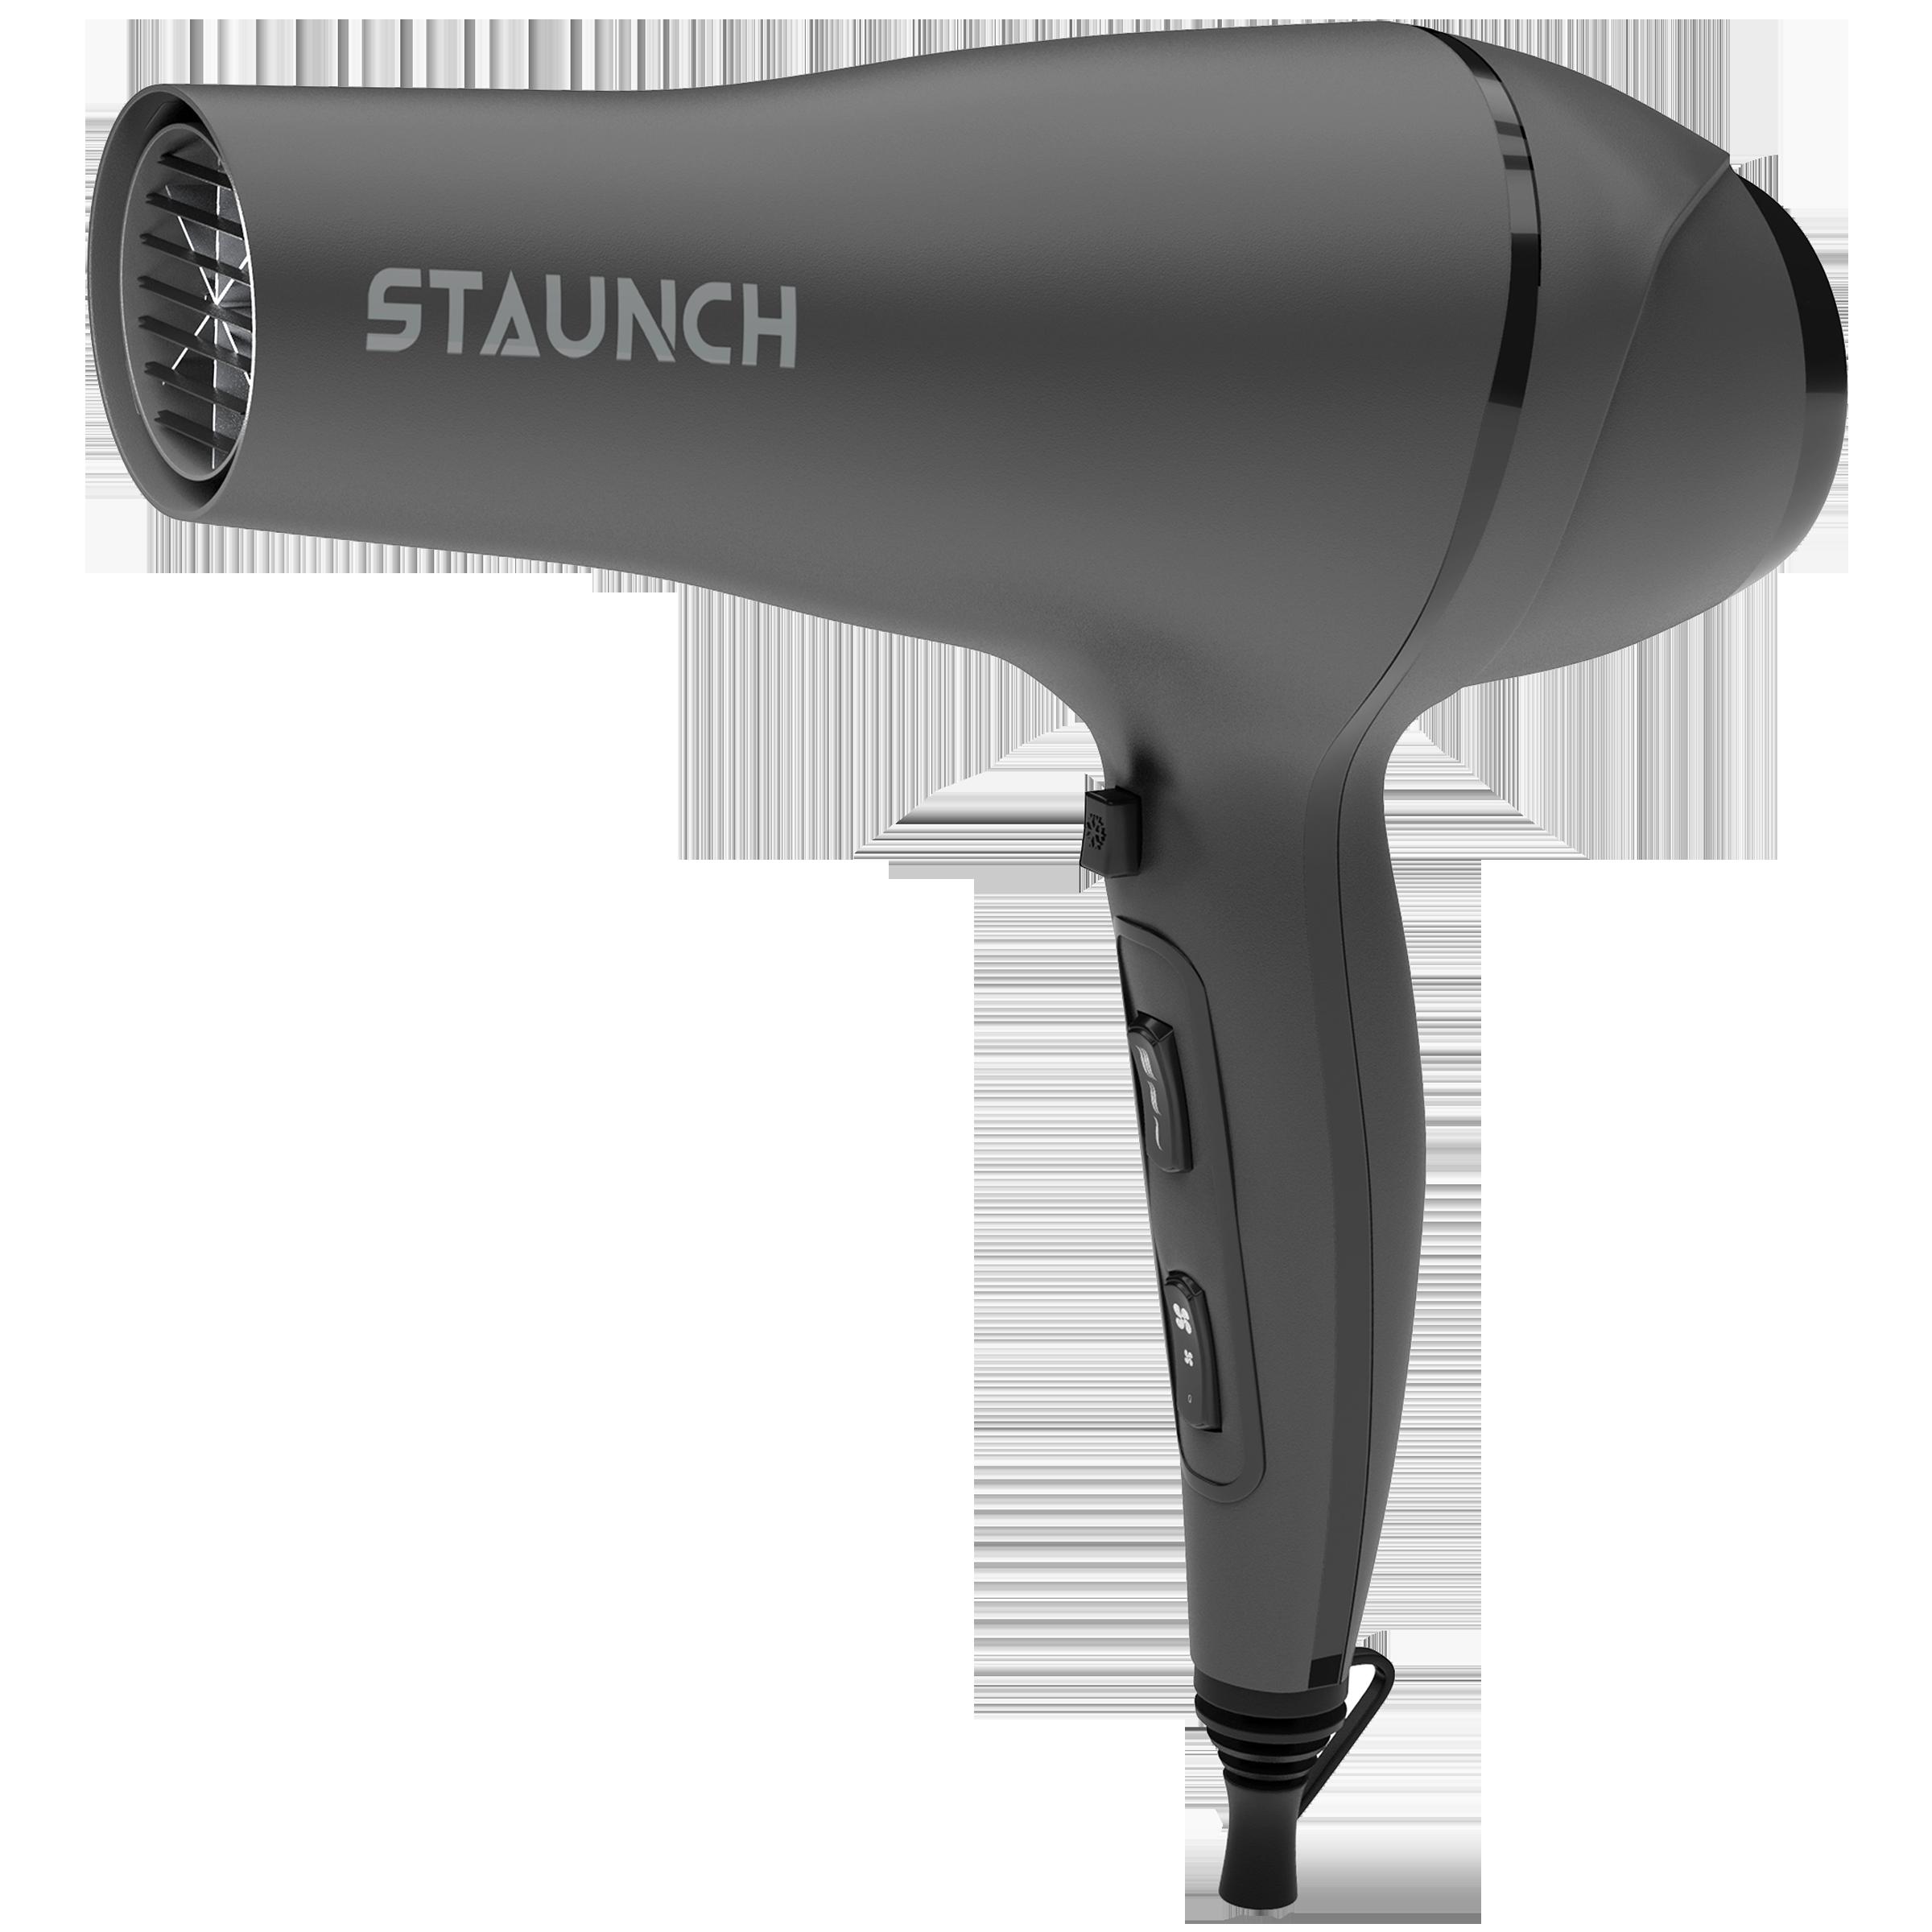 Staunch 3 Setting Hair Dryer (Heat Balanced Technology, SHD3012, Black)_1